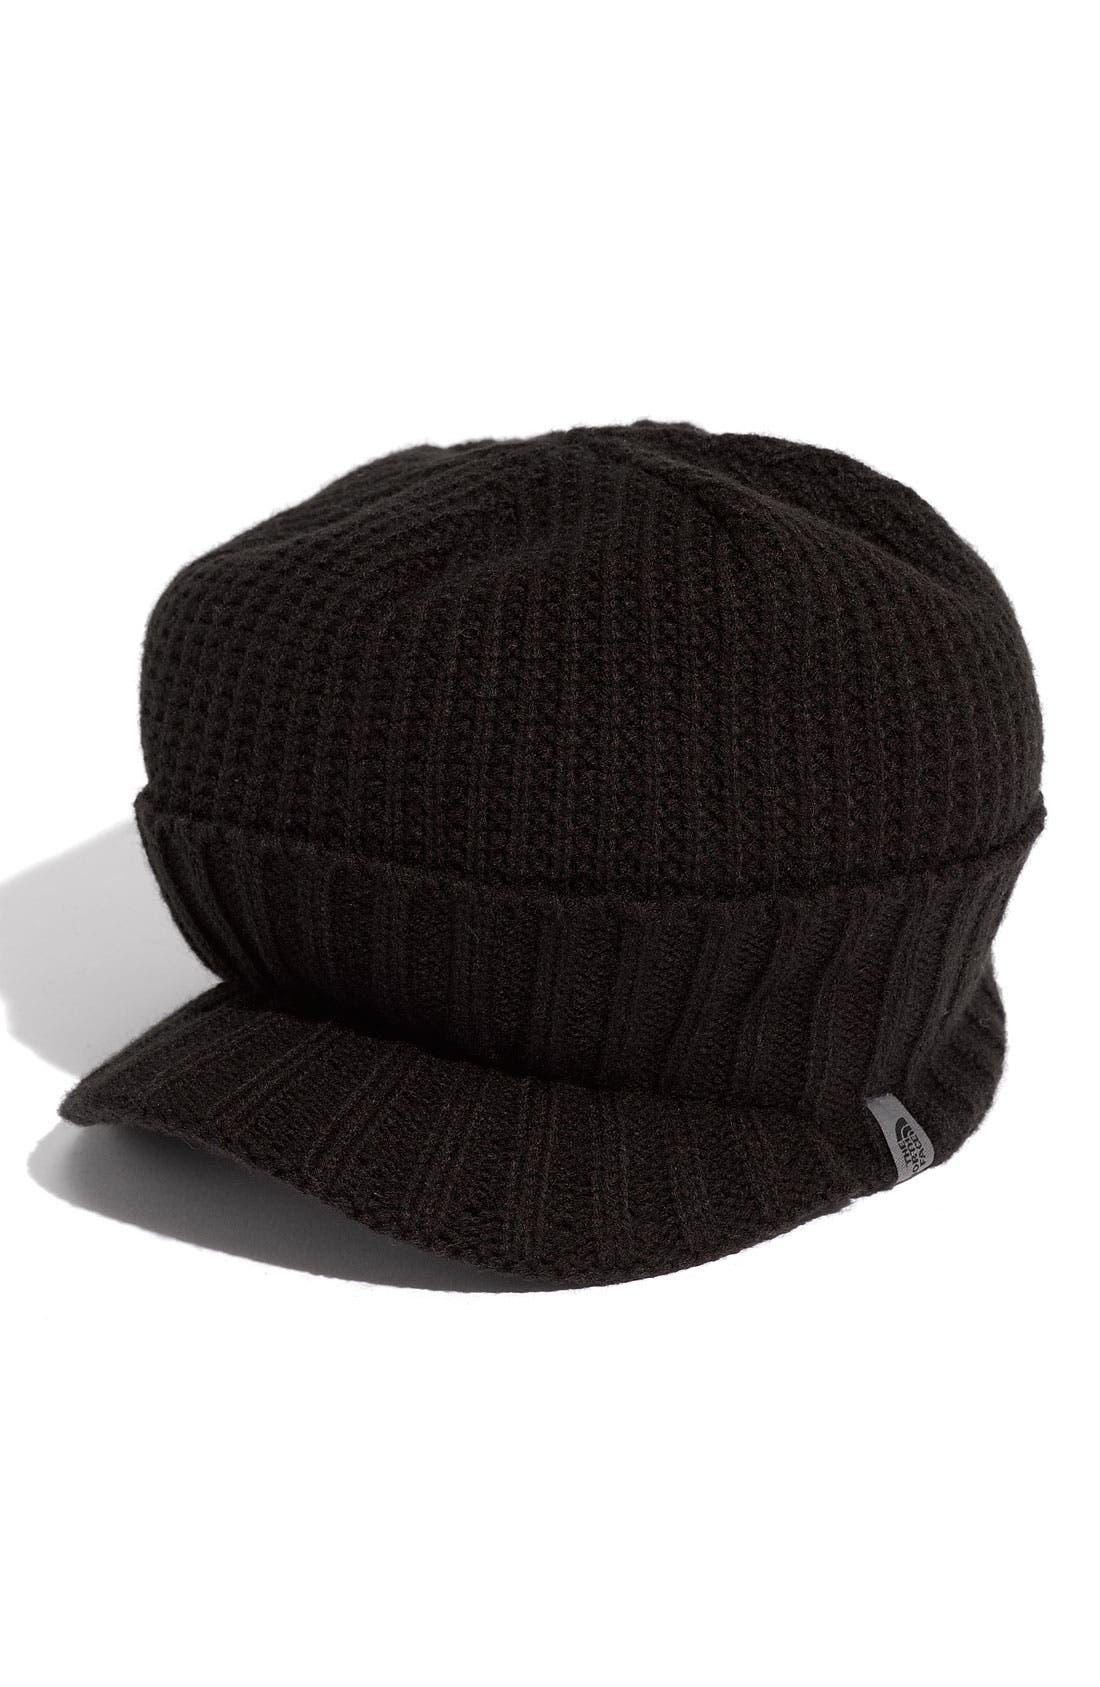 Alternate Image 2  - The North Face 'GTO' Rib Knit Visor Beanie (Men)